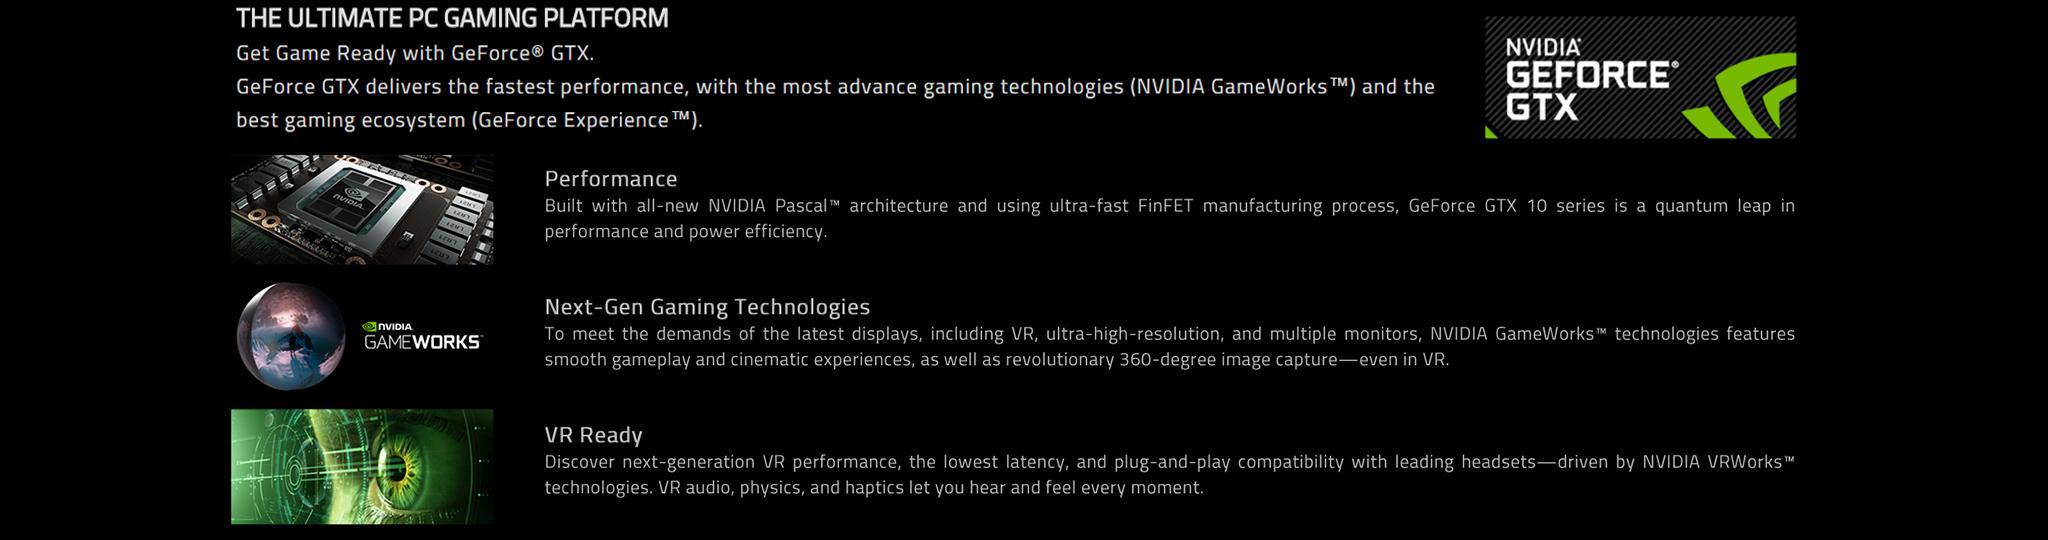 GeForce® GTX 1070 G1 Gaming 8G (rev  1 0) | Graphics Card